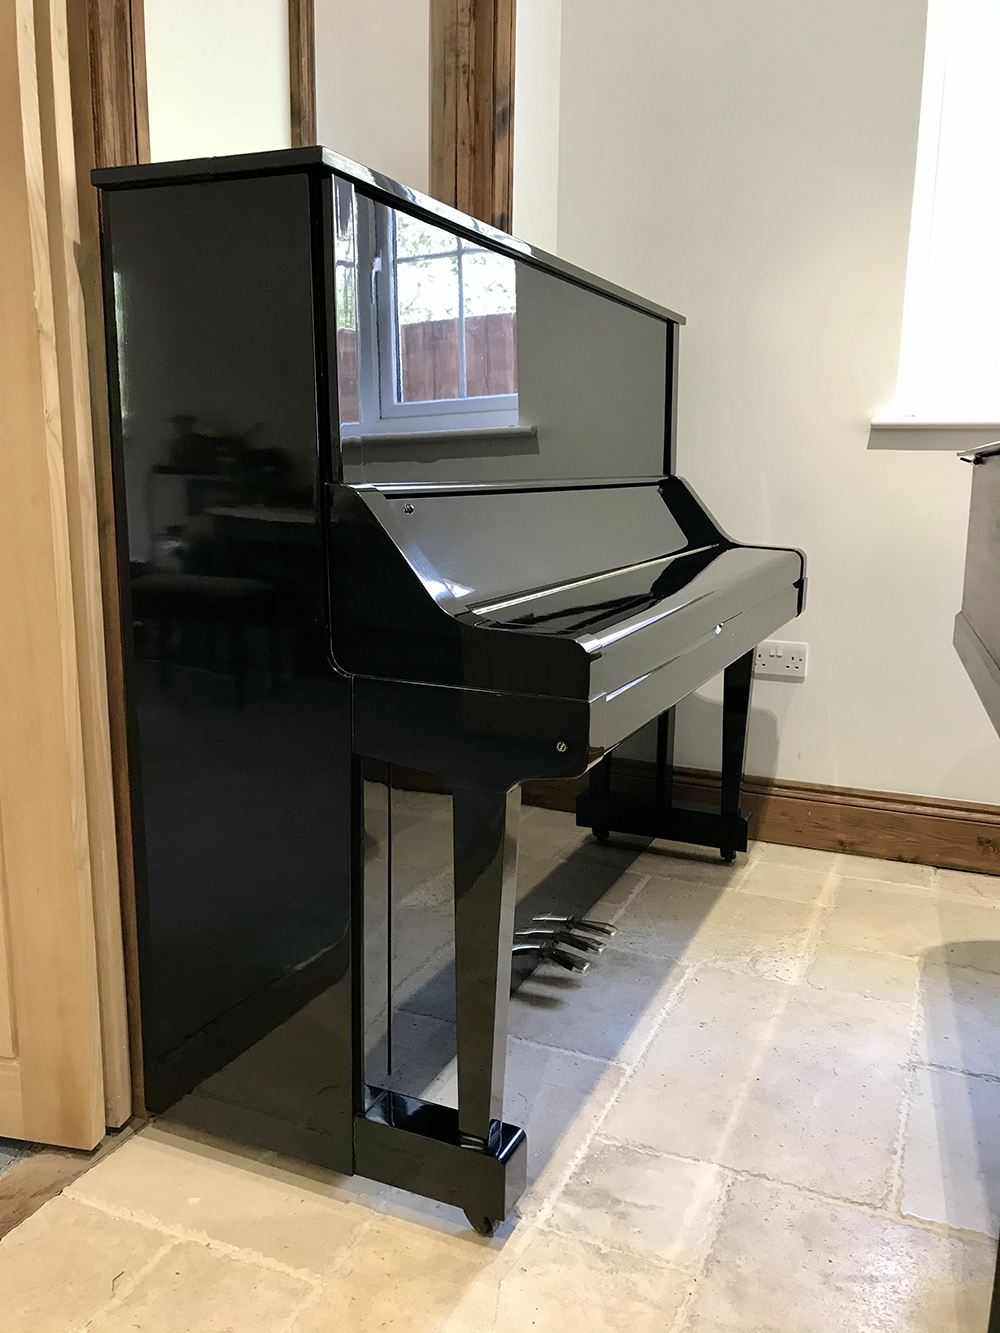 Yamaha-Piano-Dorset-U3-X-6.jpg